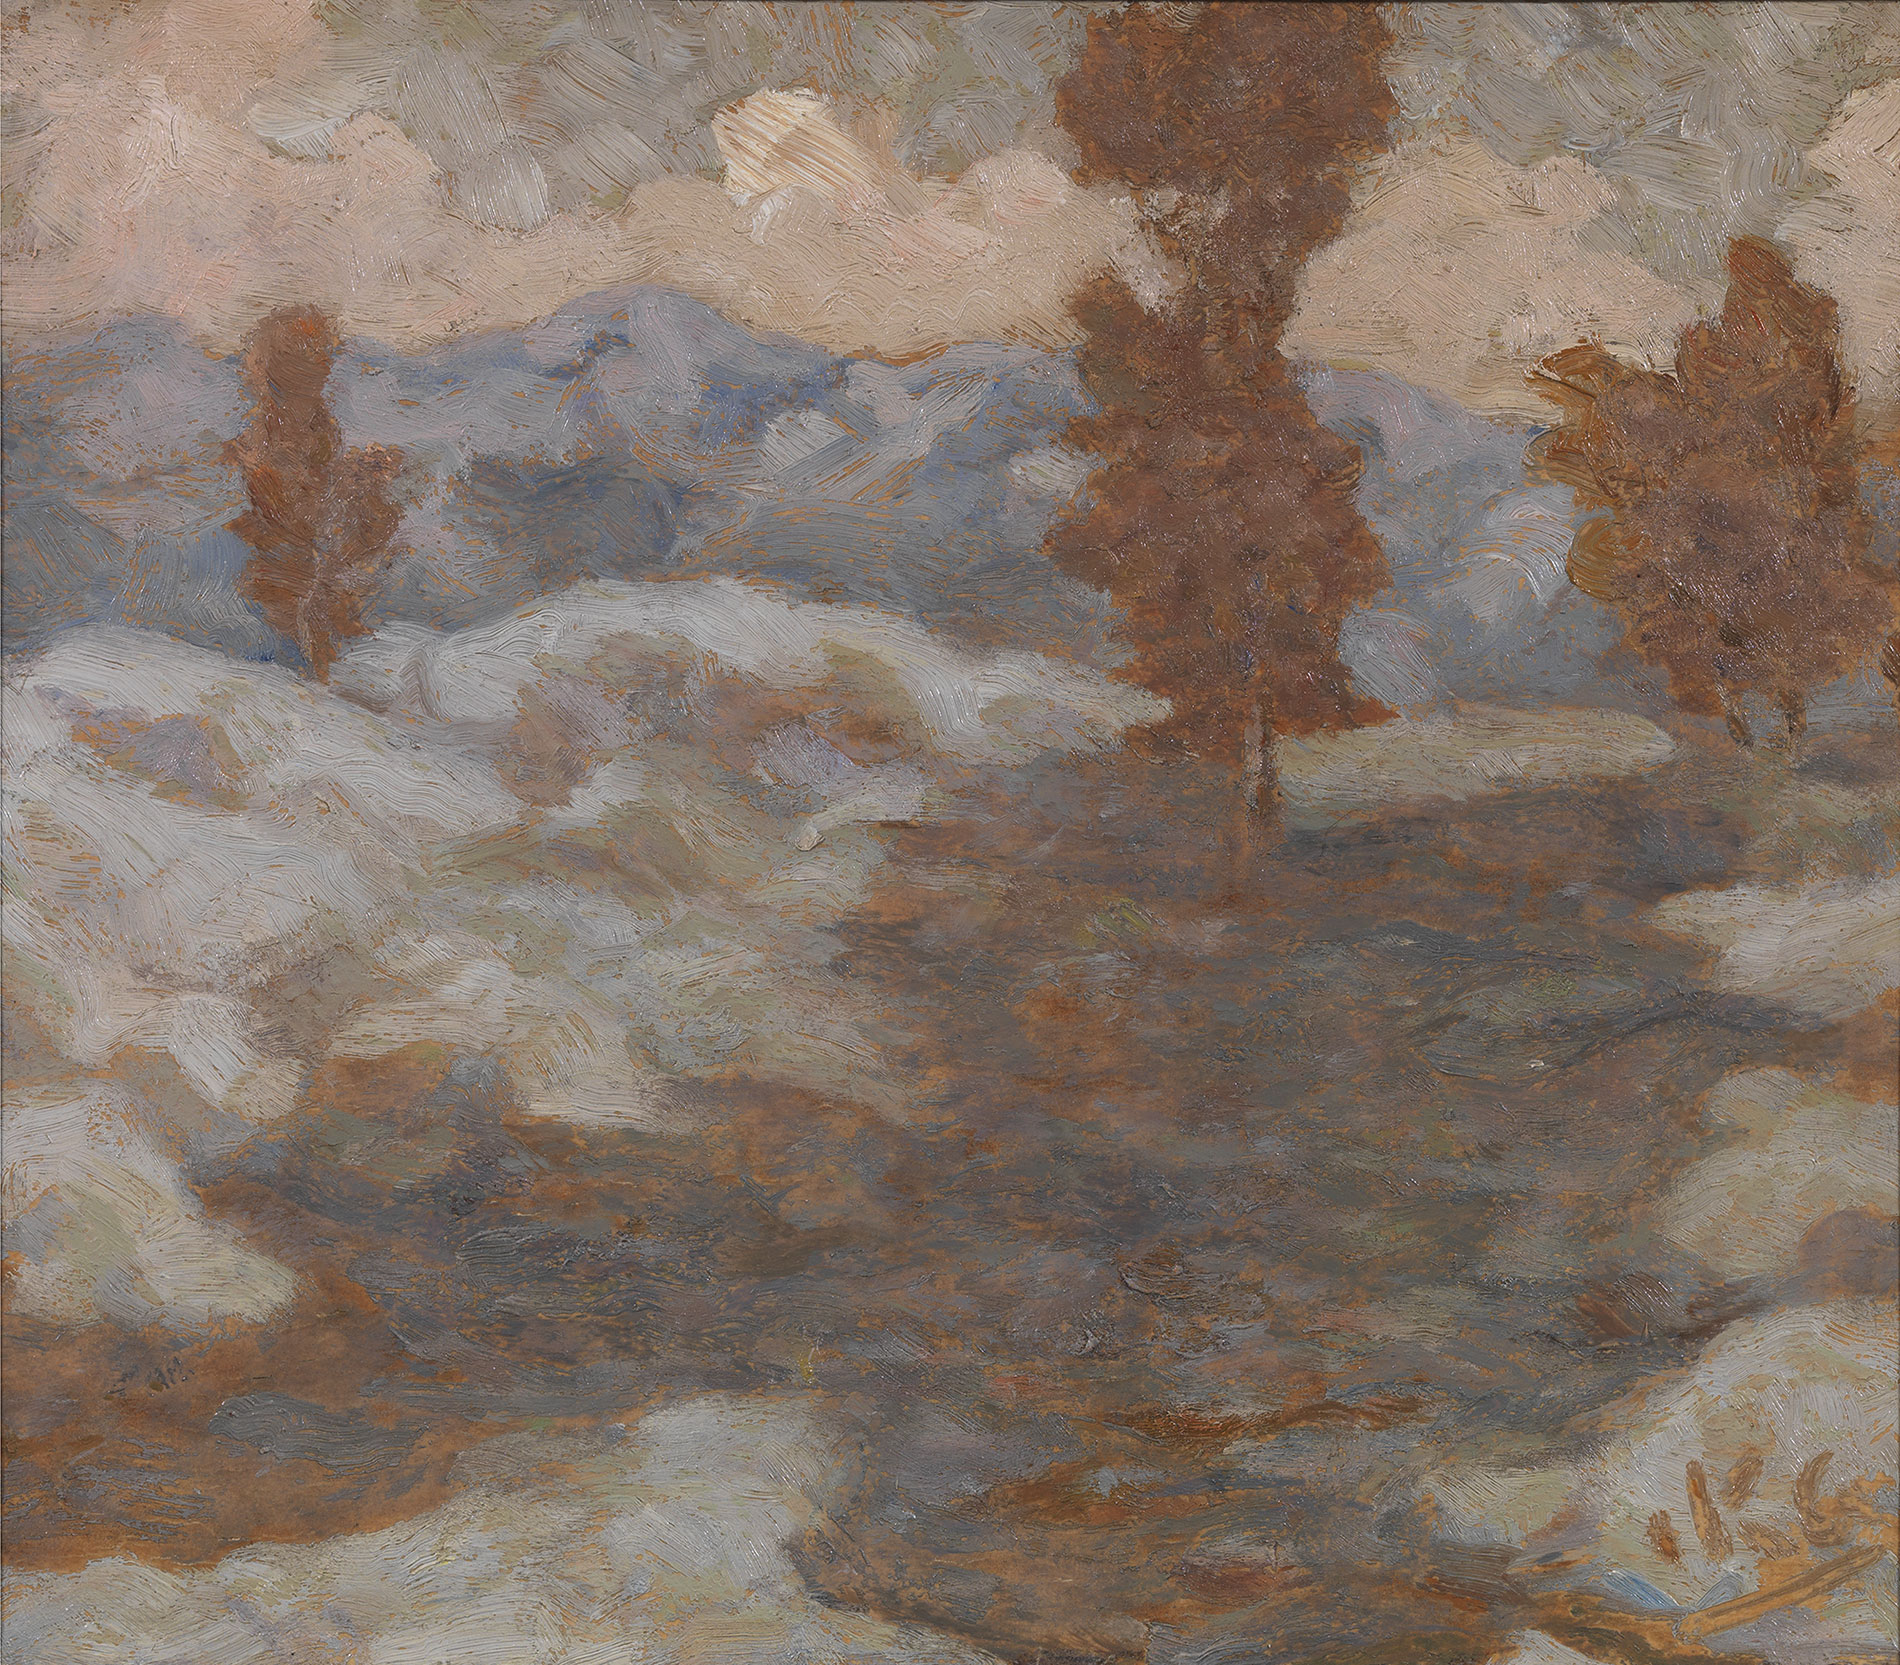 Nikolaos Othoneos - Winter landscape